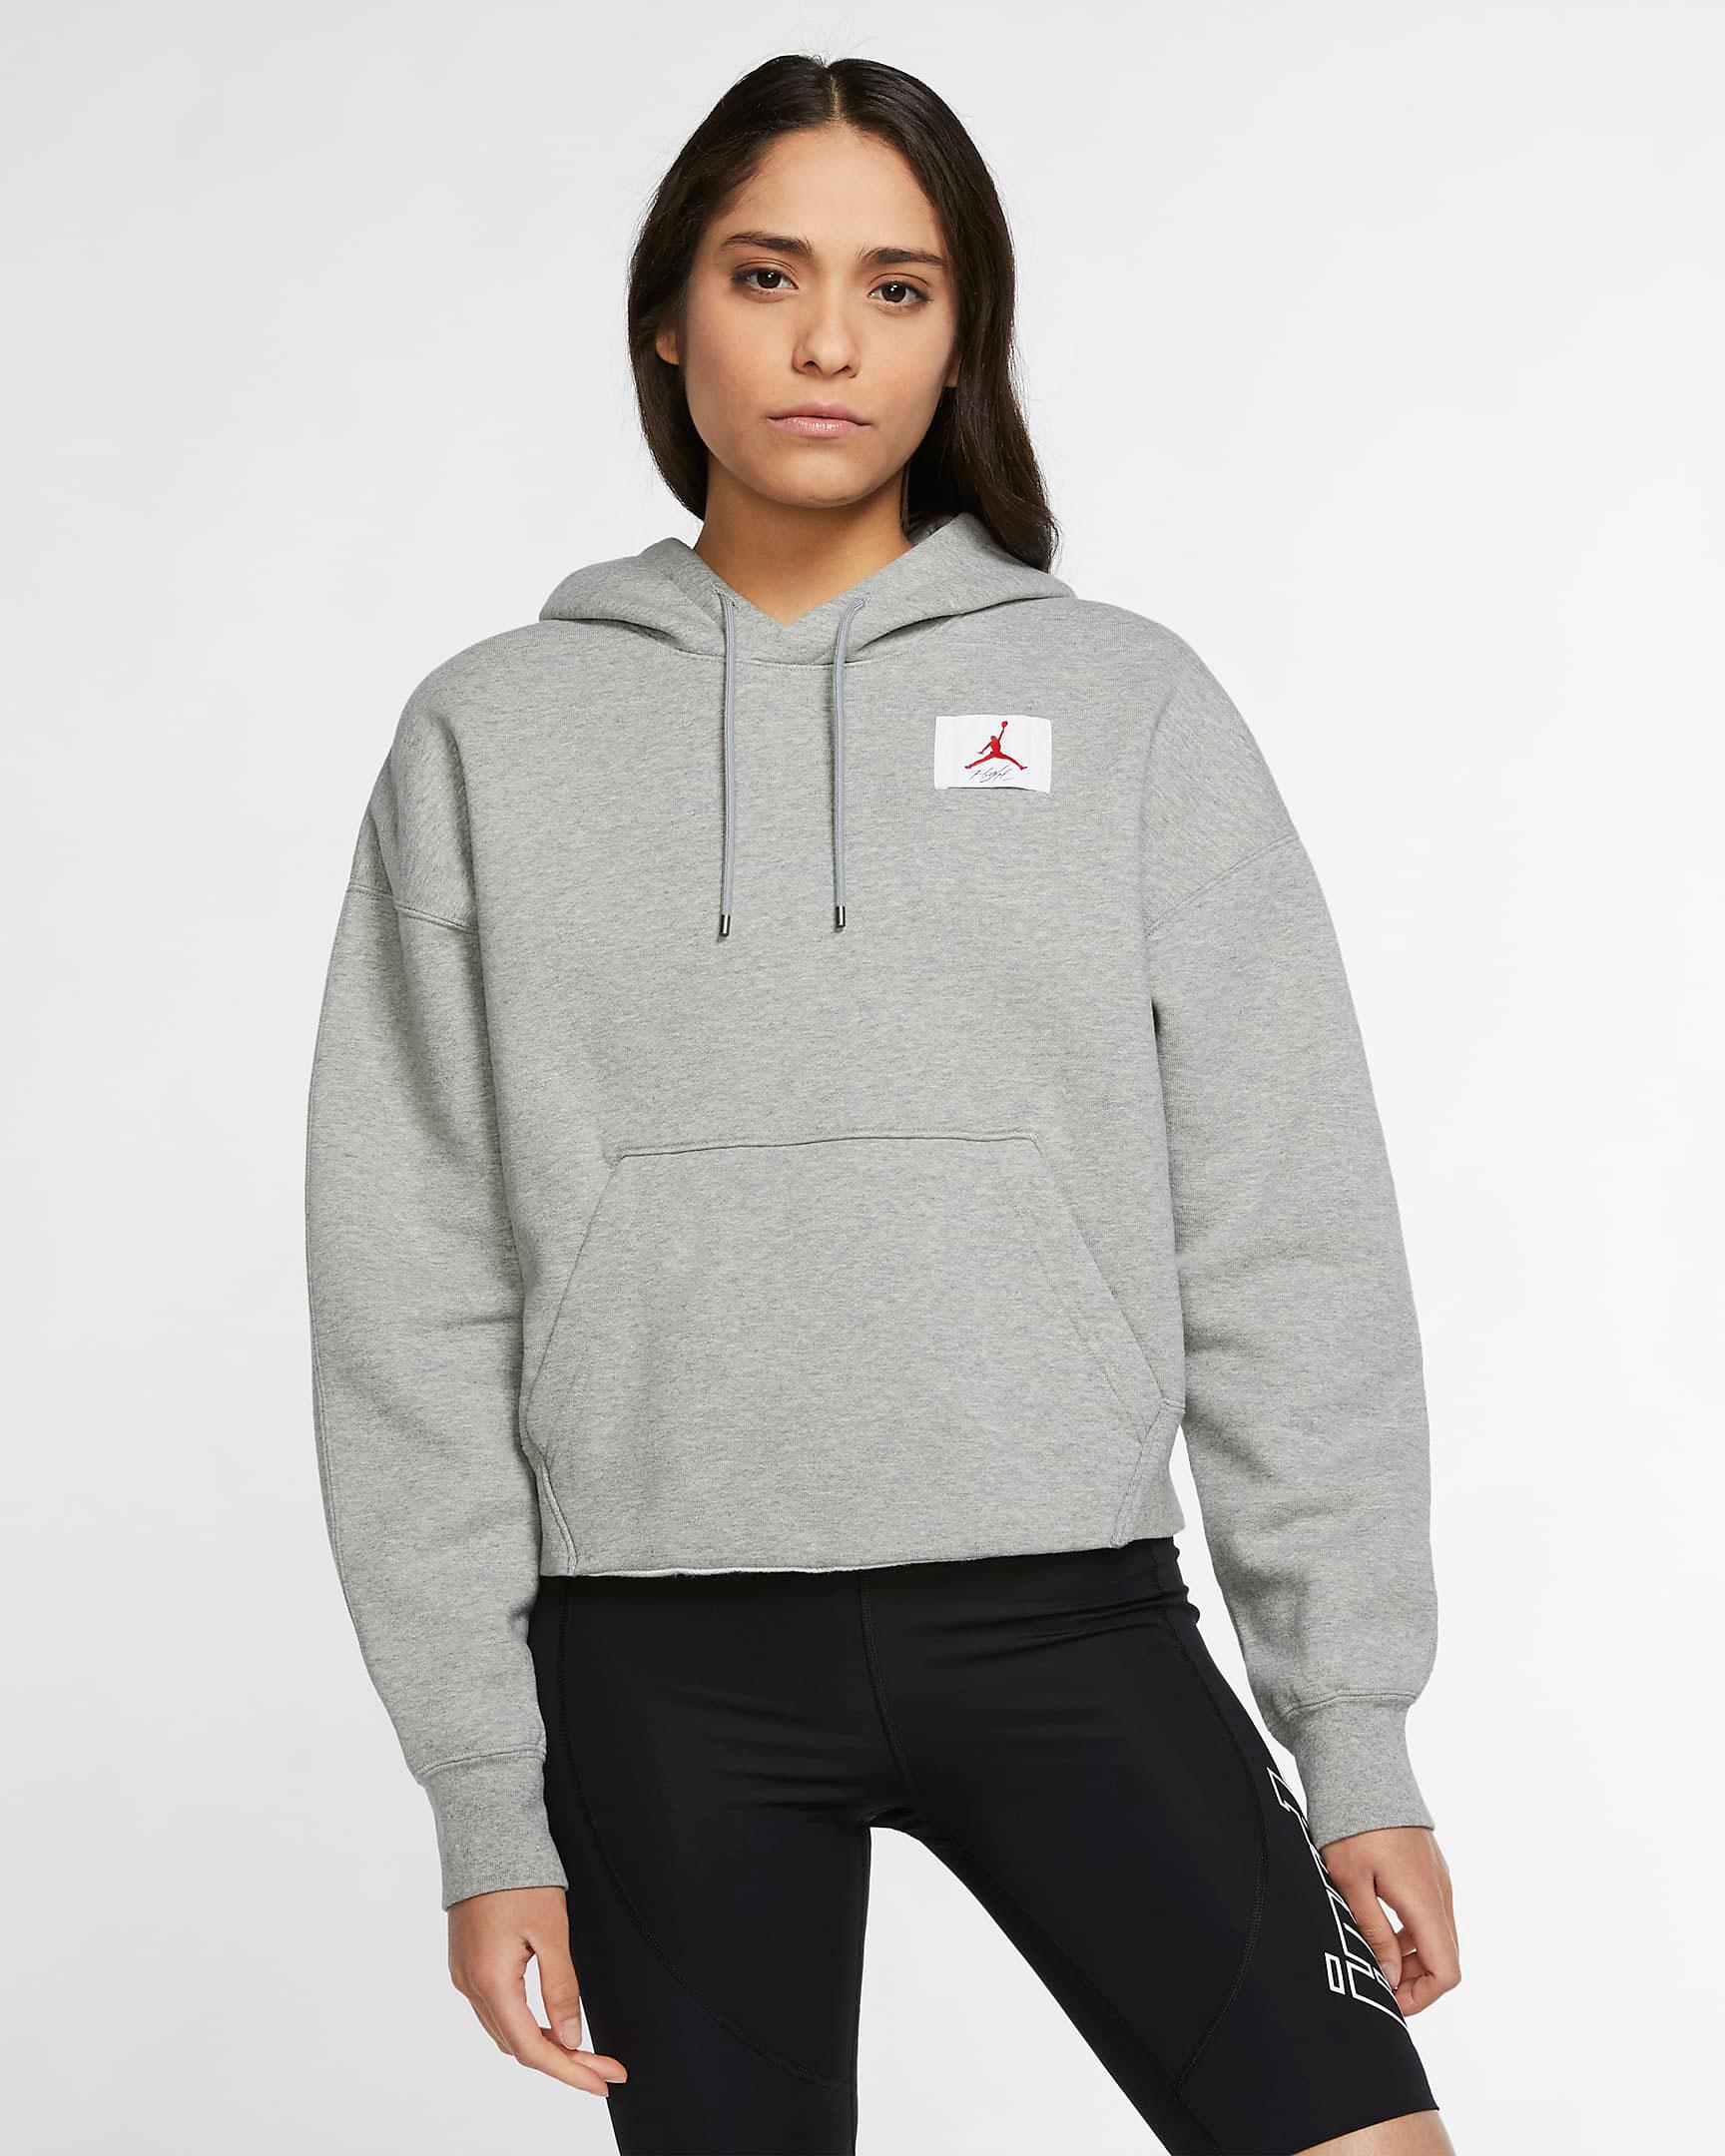 air-jordan-6-womens-tech-chrome-hoodie-match